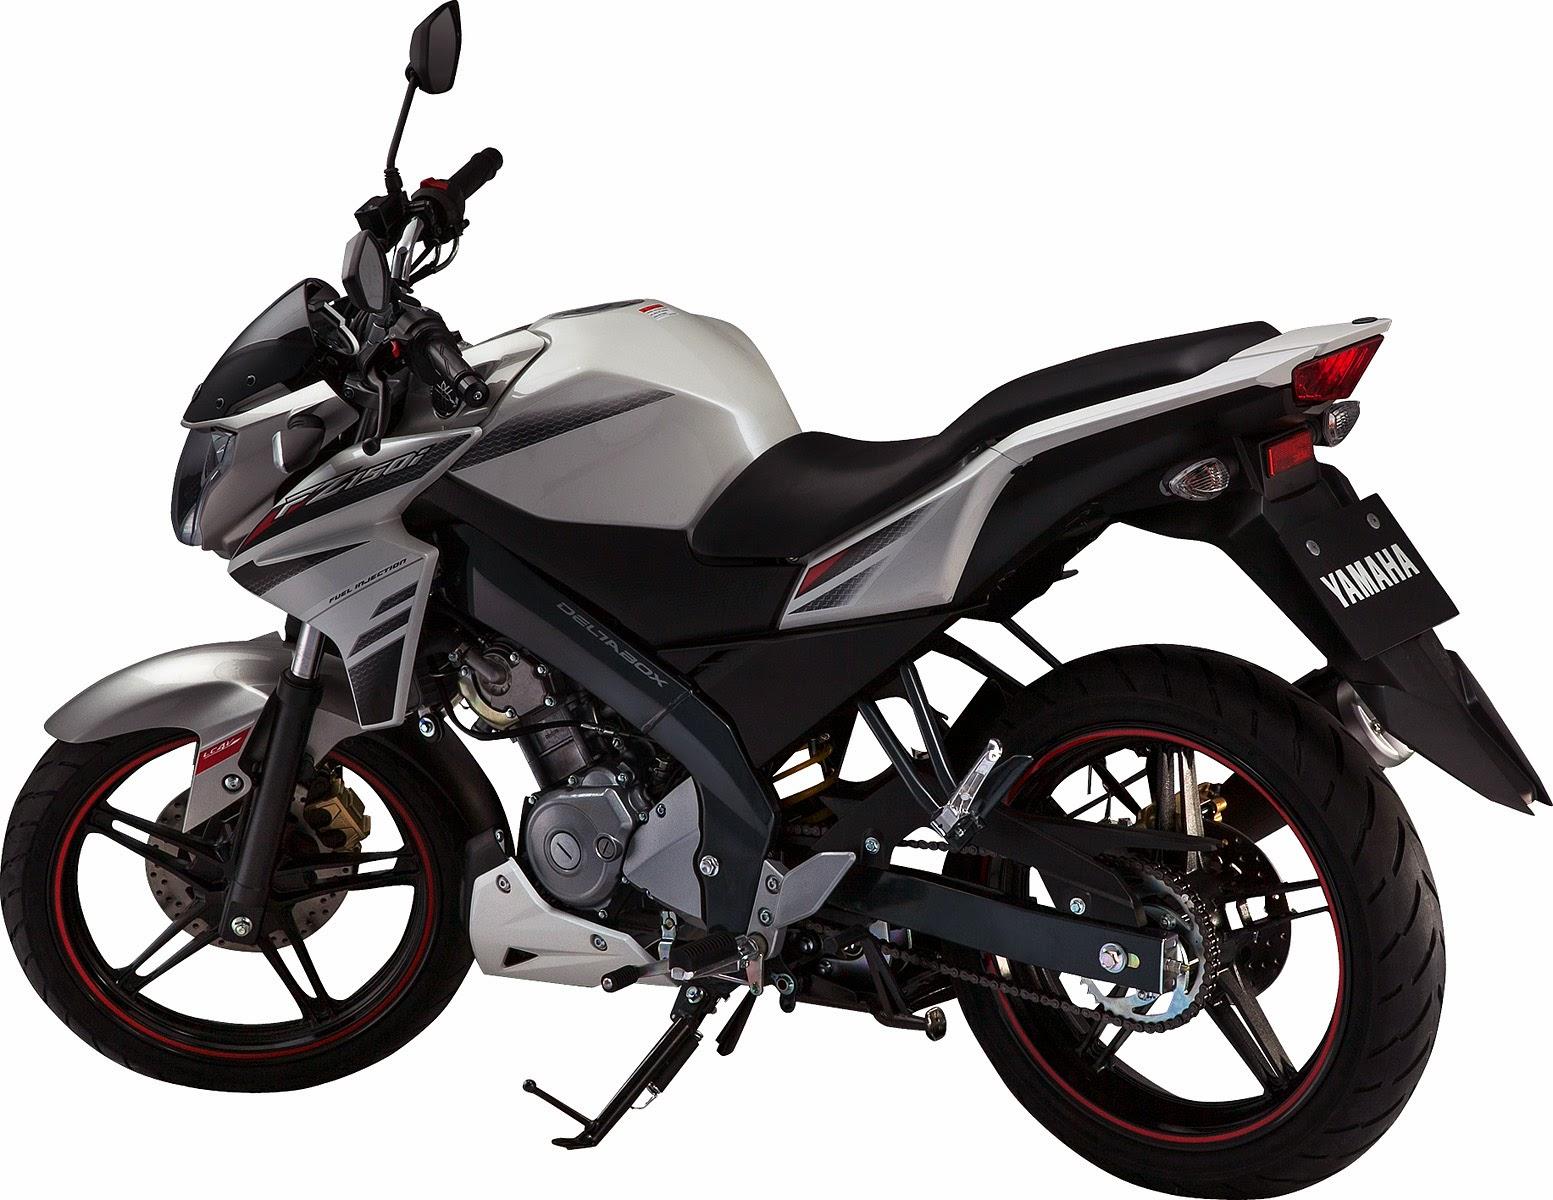 Harga kredit motor yamaha new vixion terbaru 2017 sangat for New yamaha motor